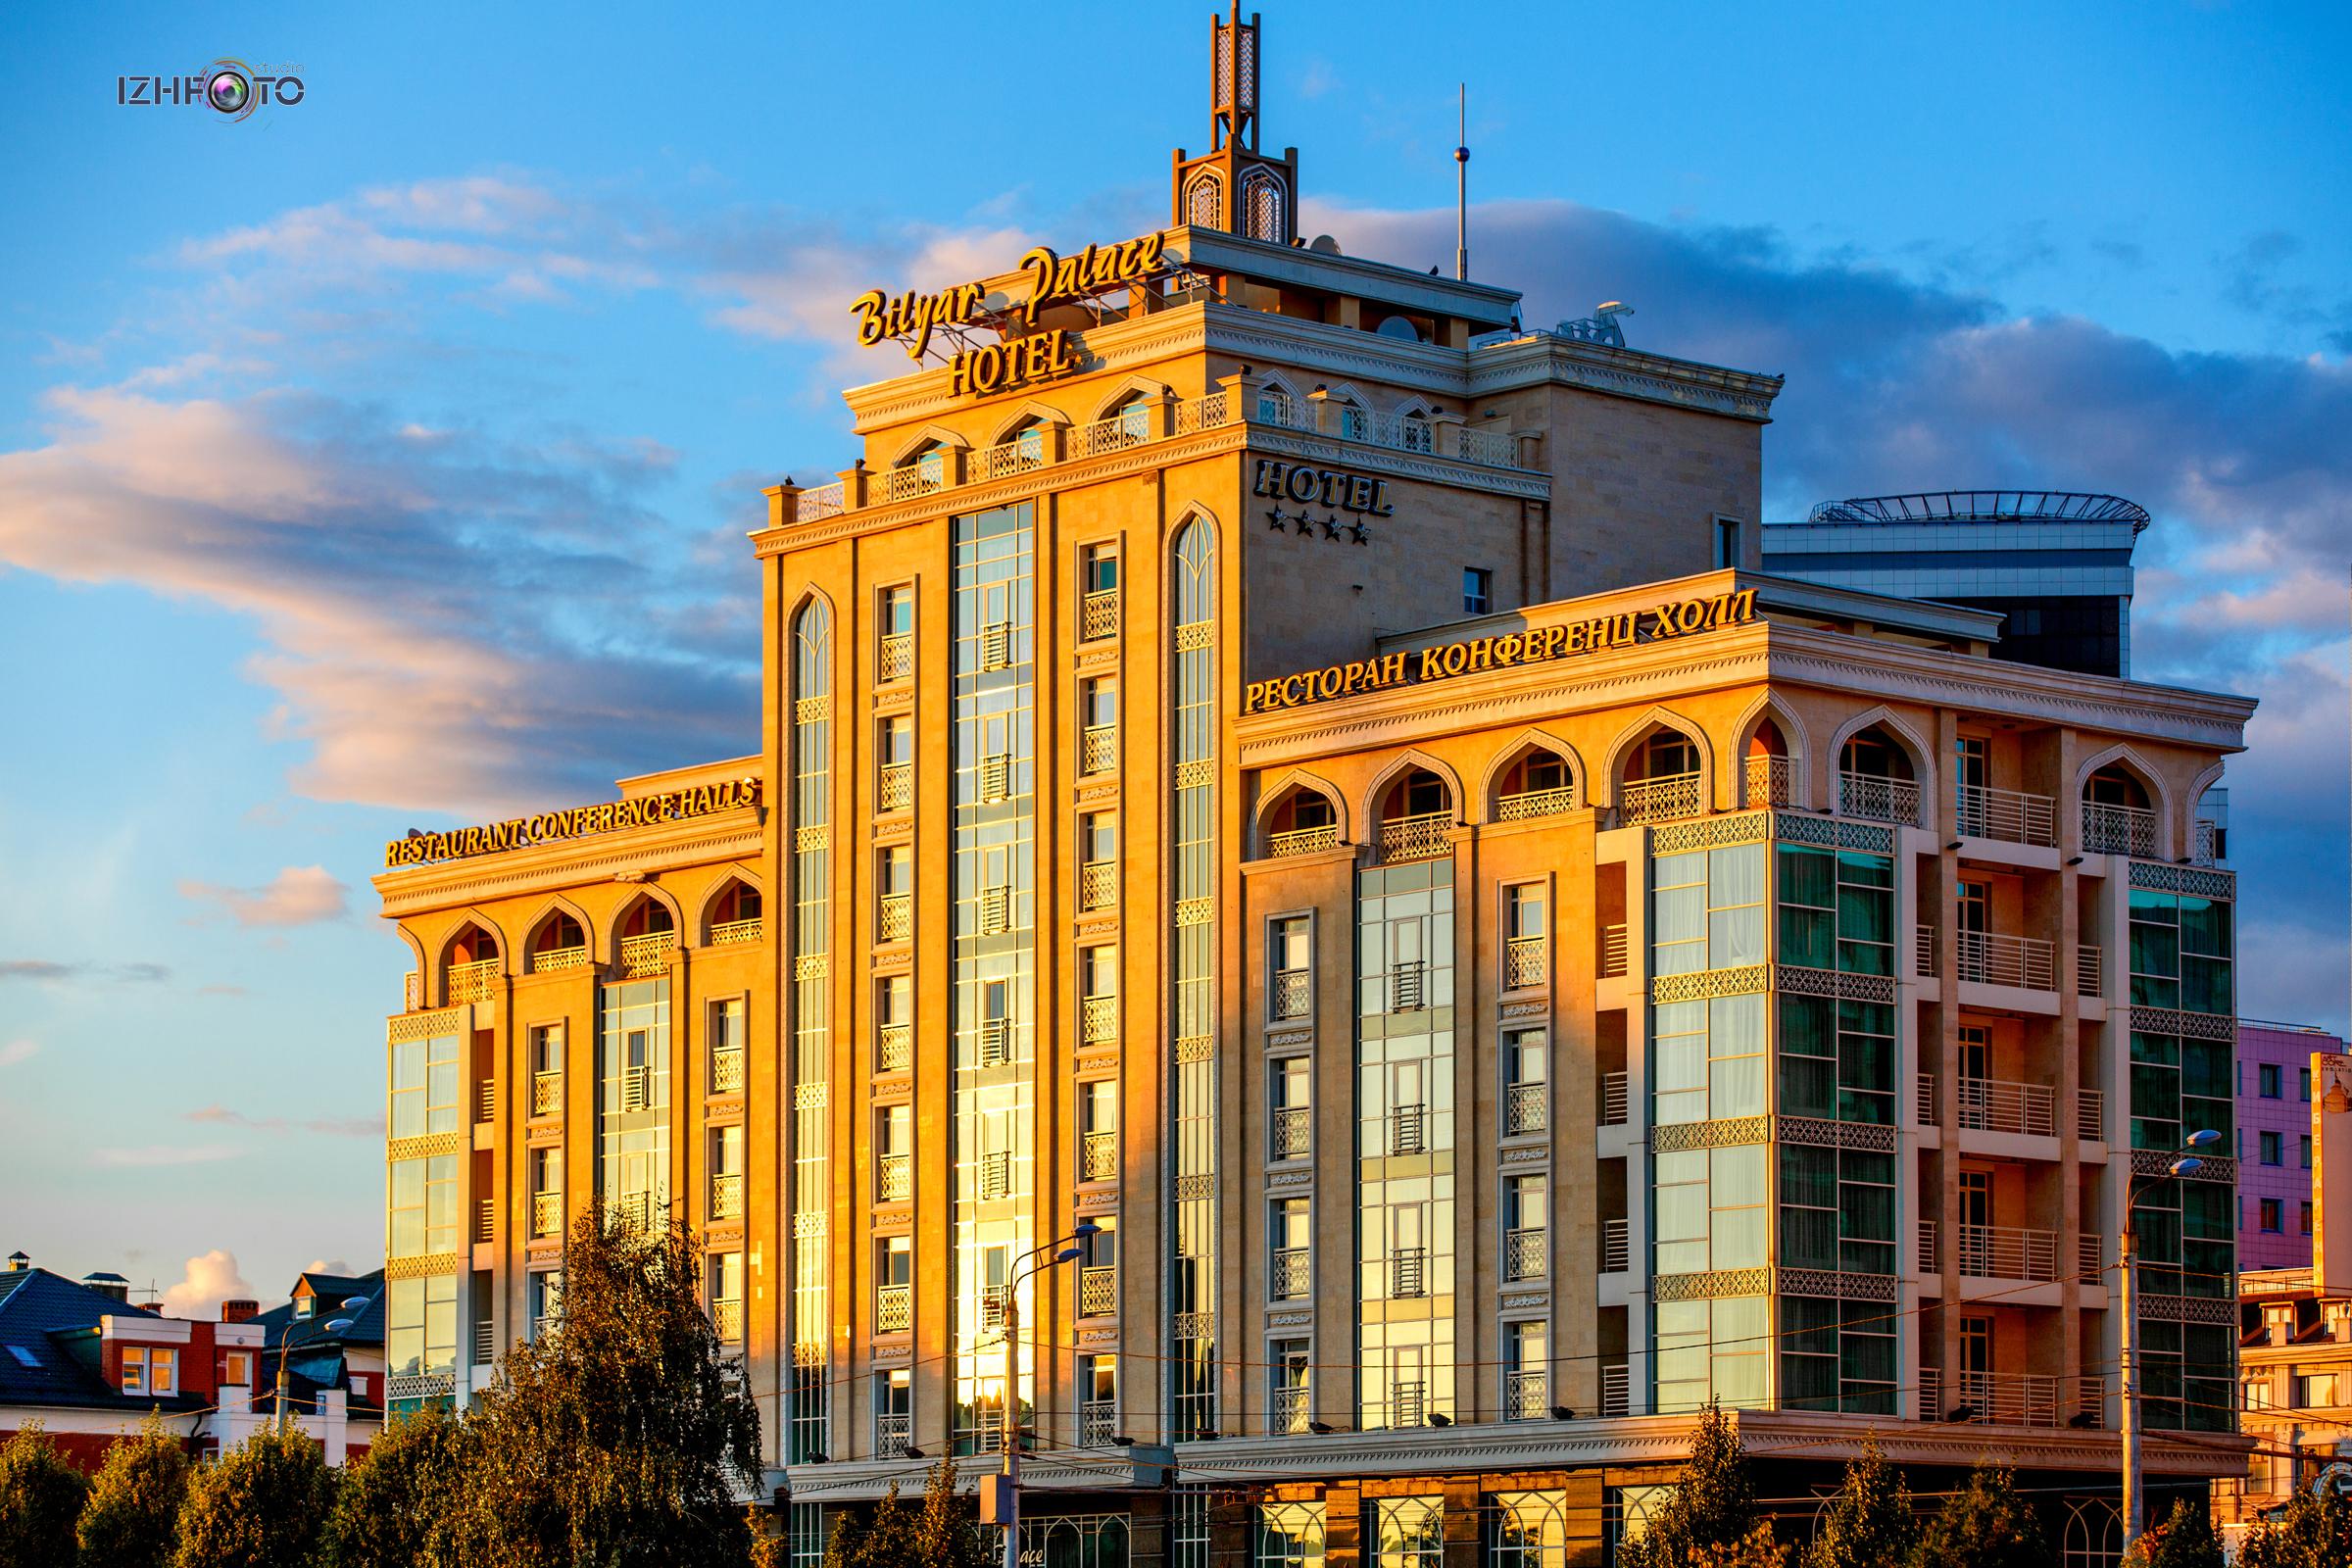 Фото Bilyar Palace Hotel Kazan на закате